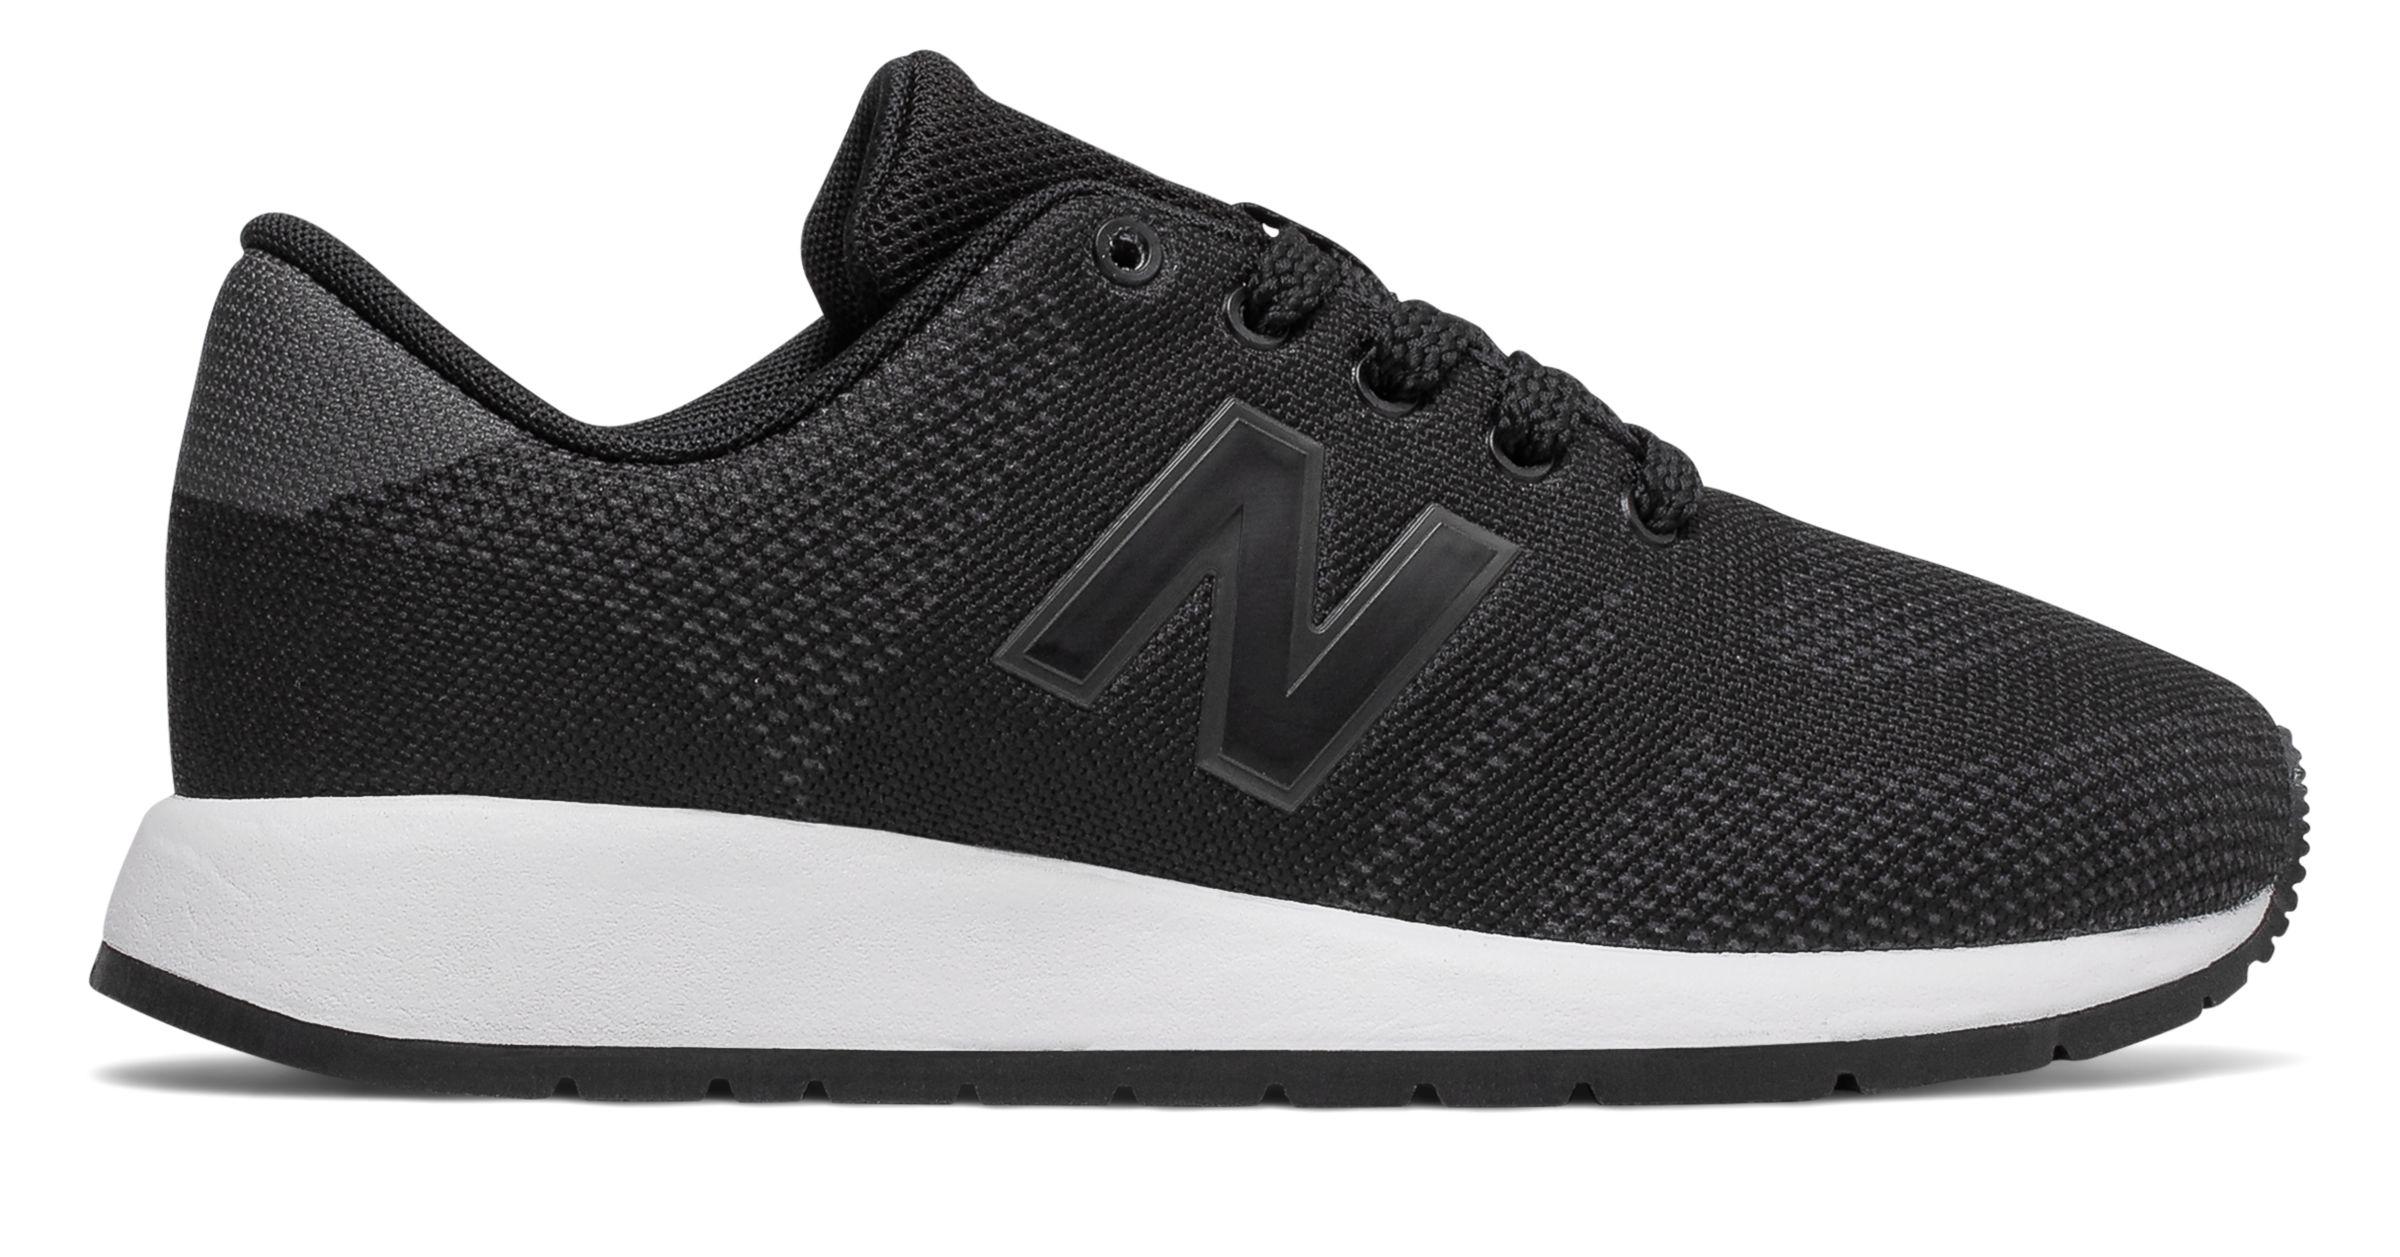 NB 420 New Balance, Black with Grey